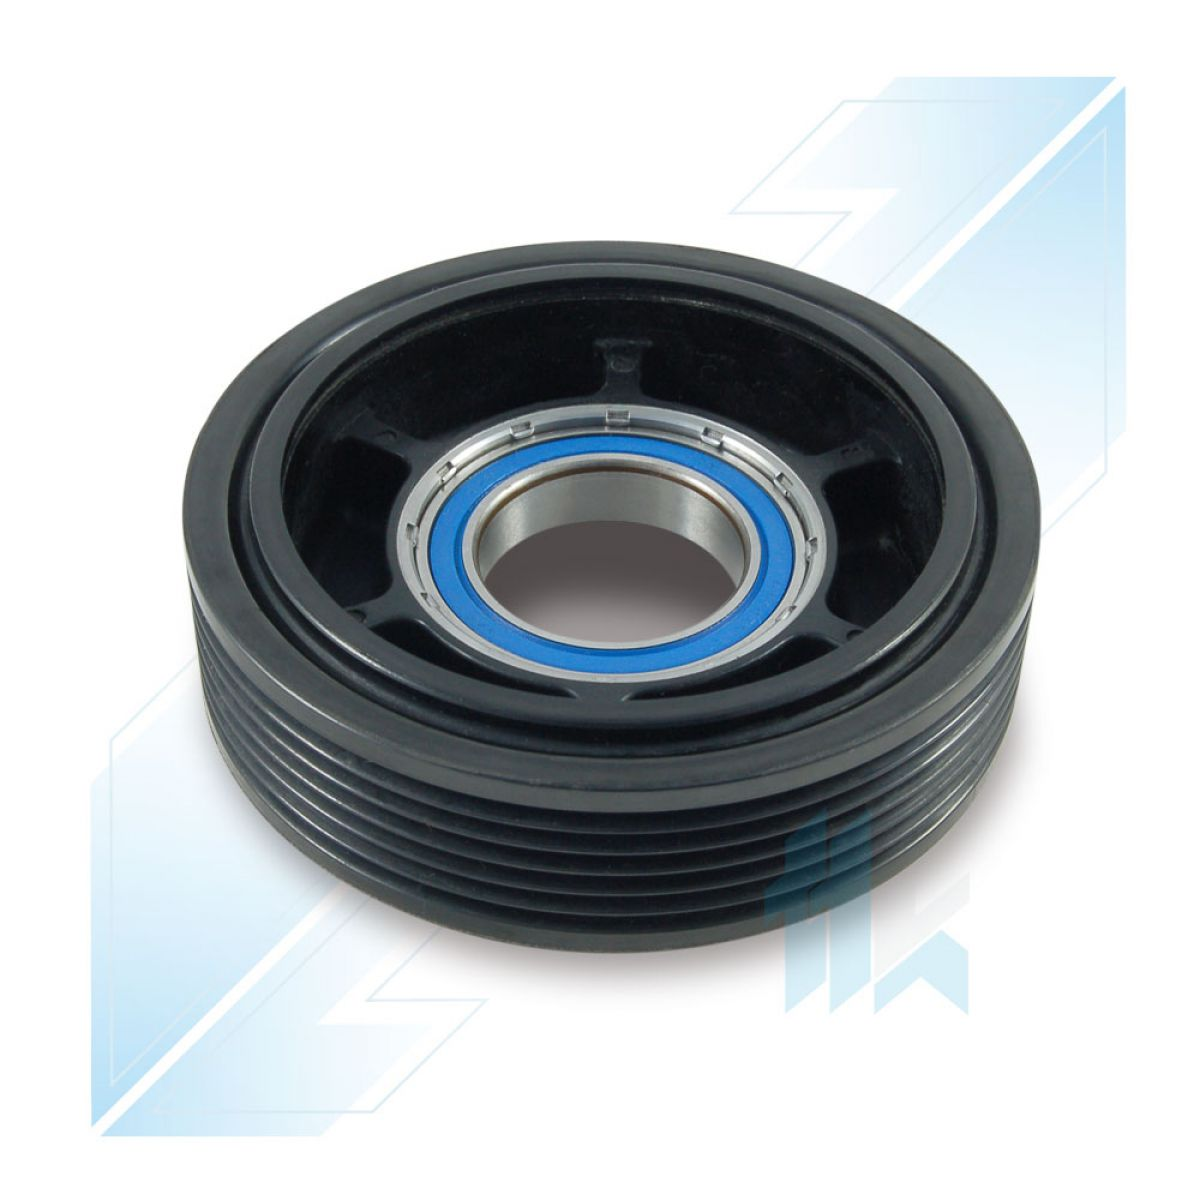 A//C Compressor Pulley fits BMW 125i F20 320i 328i 330d F30 X3 F25 64529216467